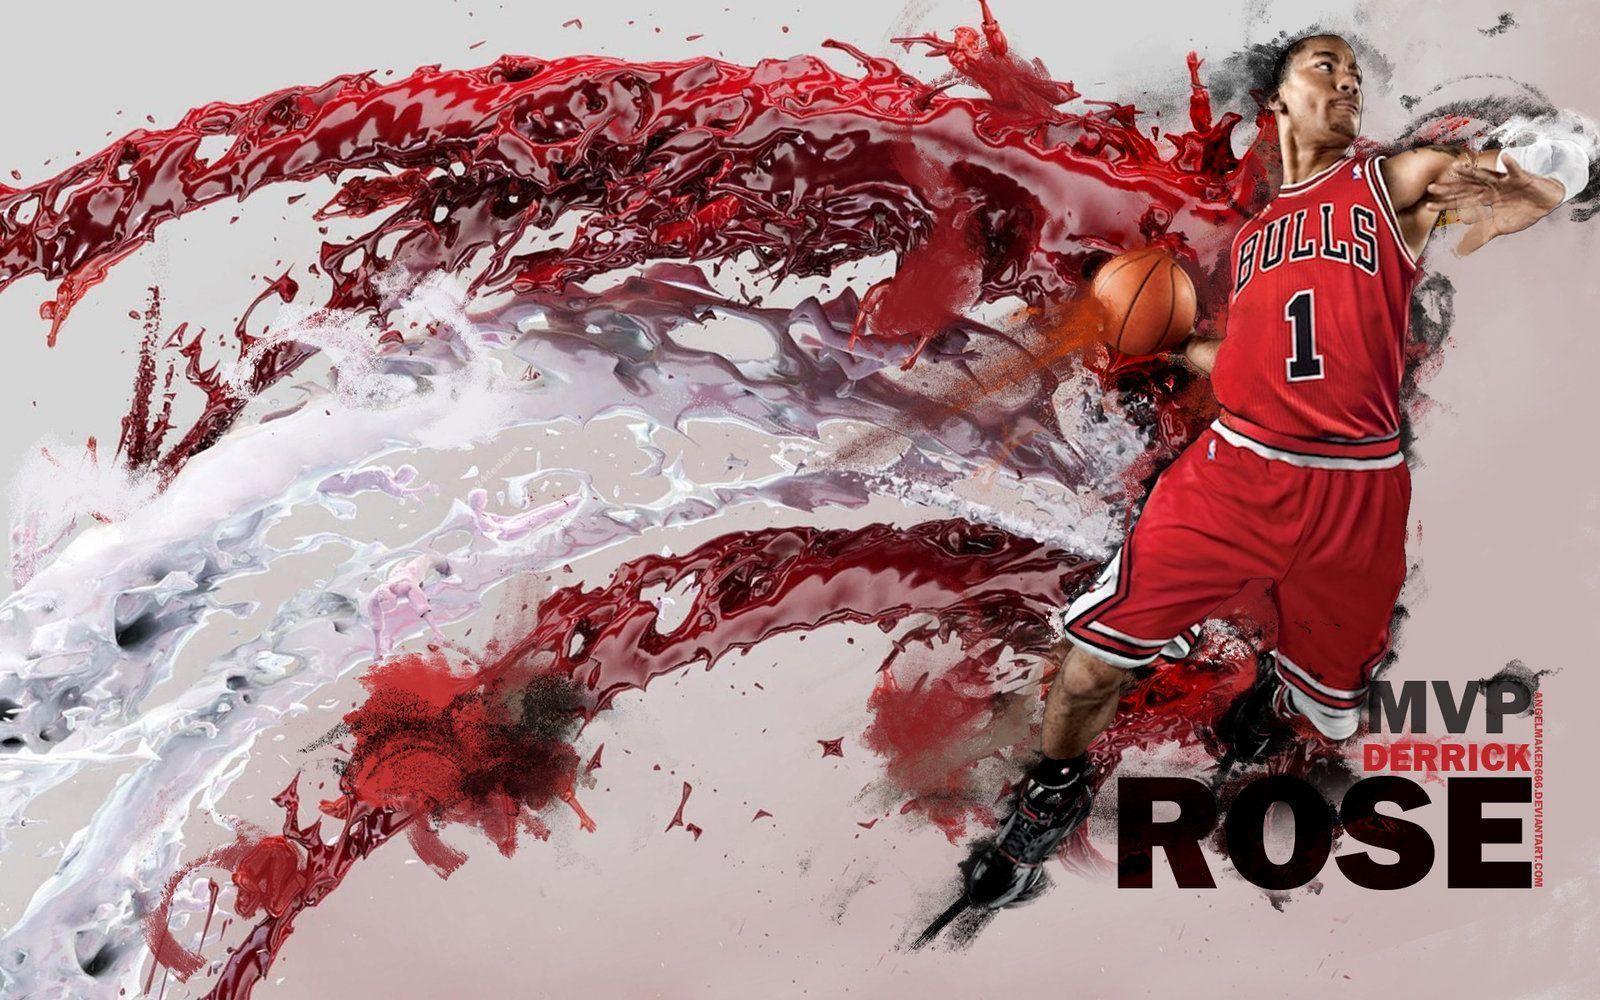 Nba chicago bulls wallpapers wallpaper cave - Derrick rose cool wallpaper ...